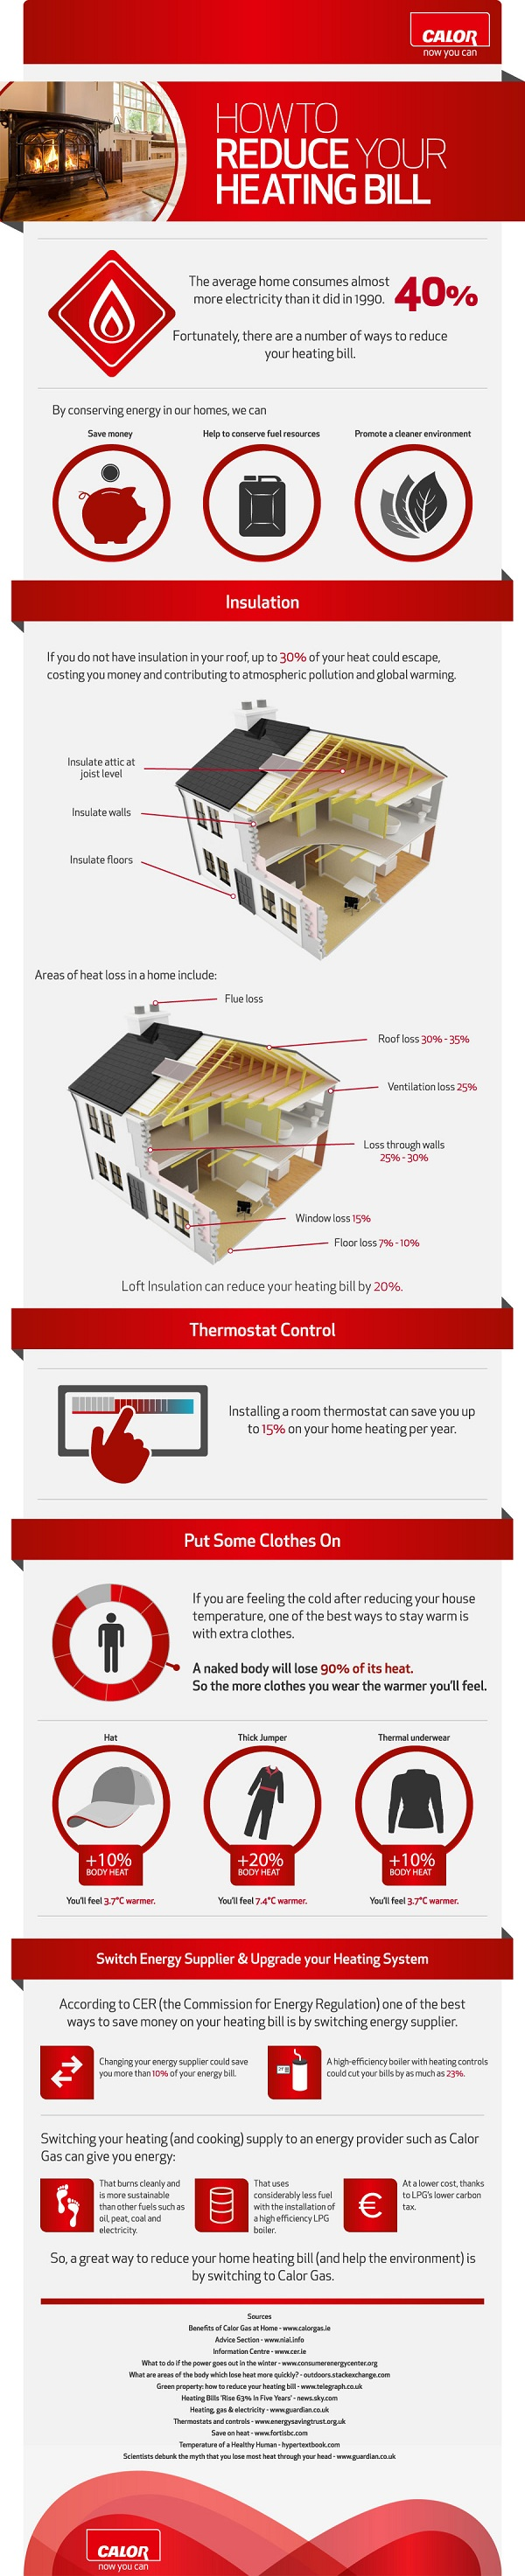 Home Heating Savings-Infographic